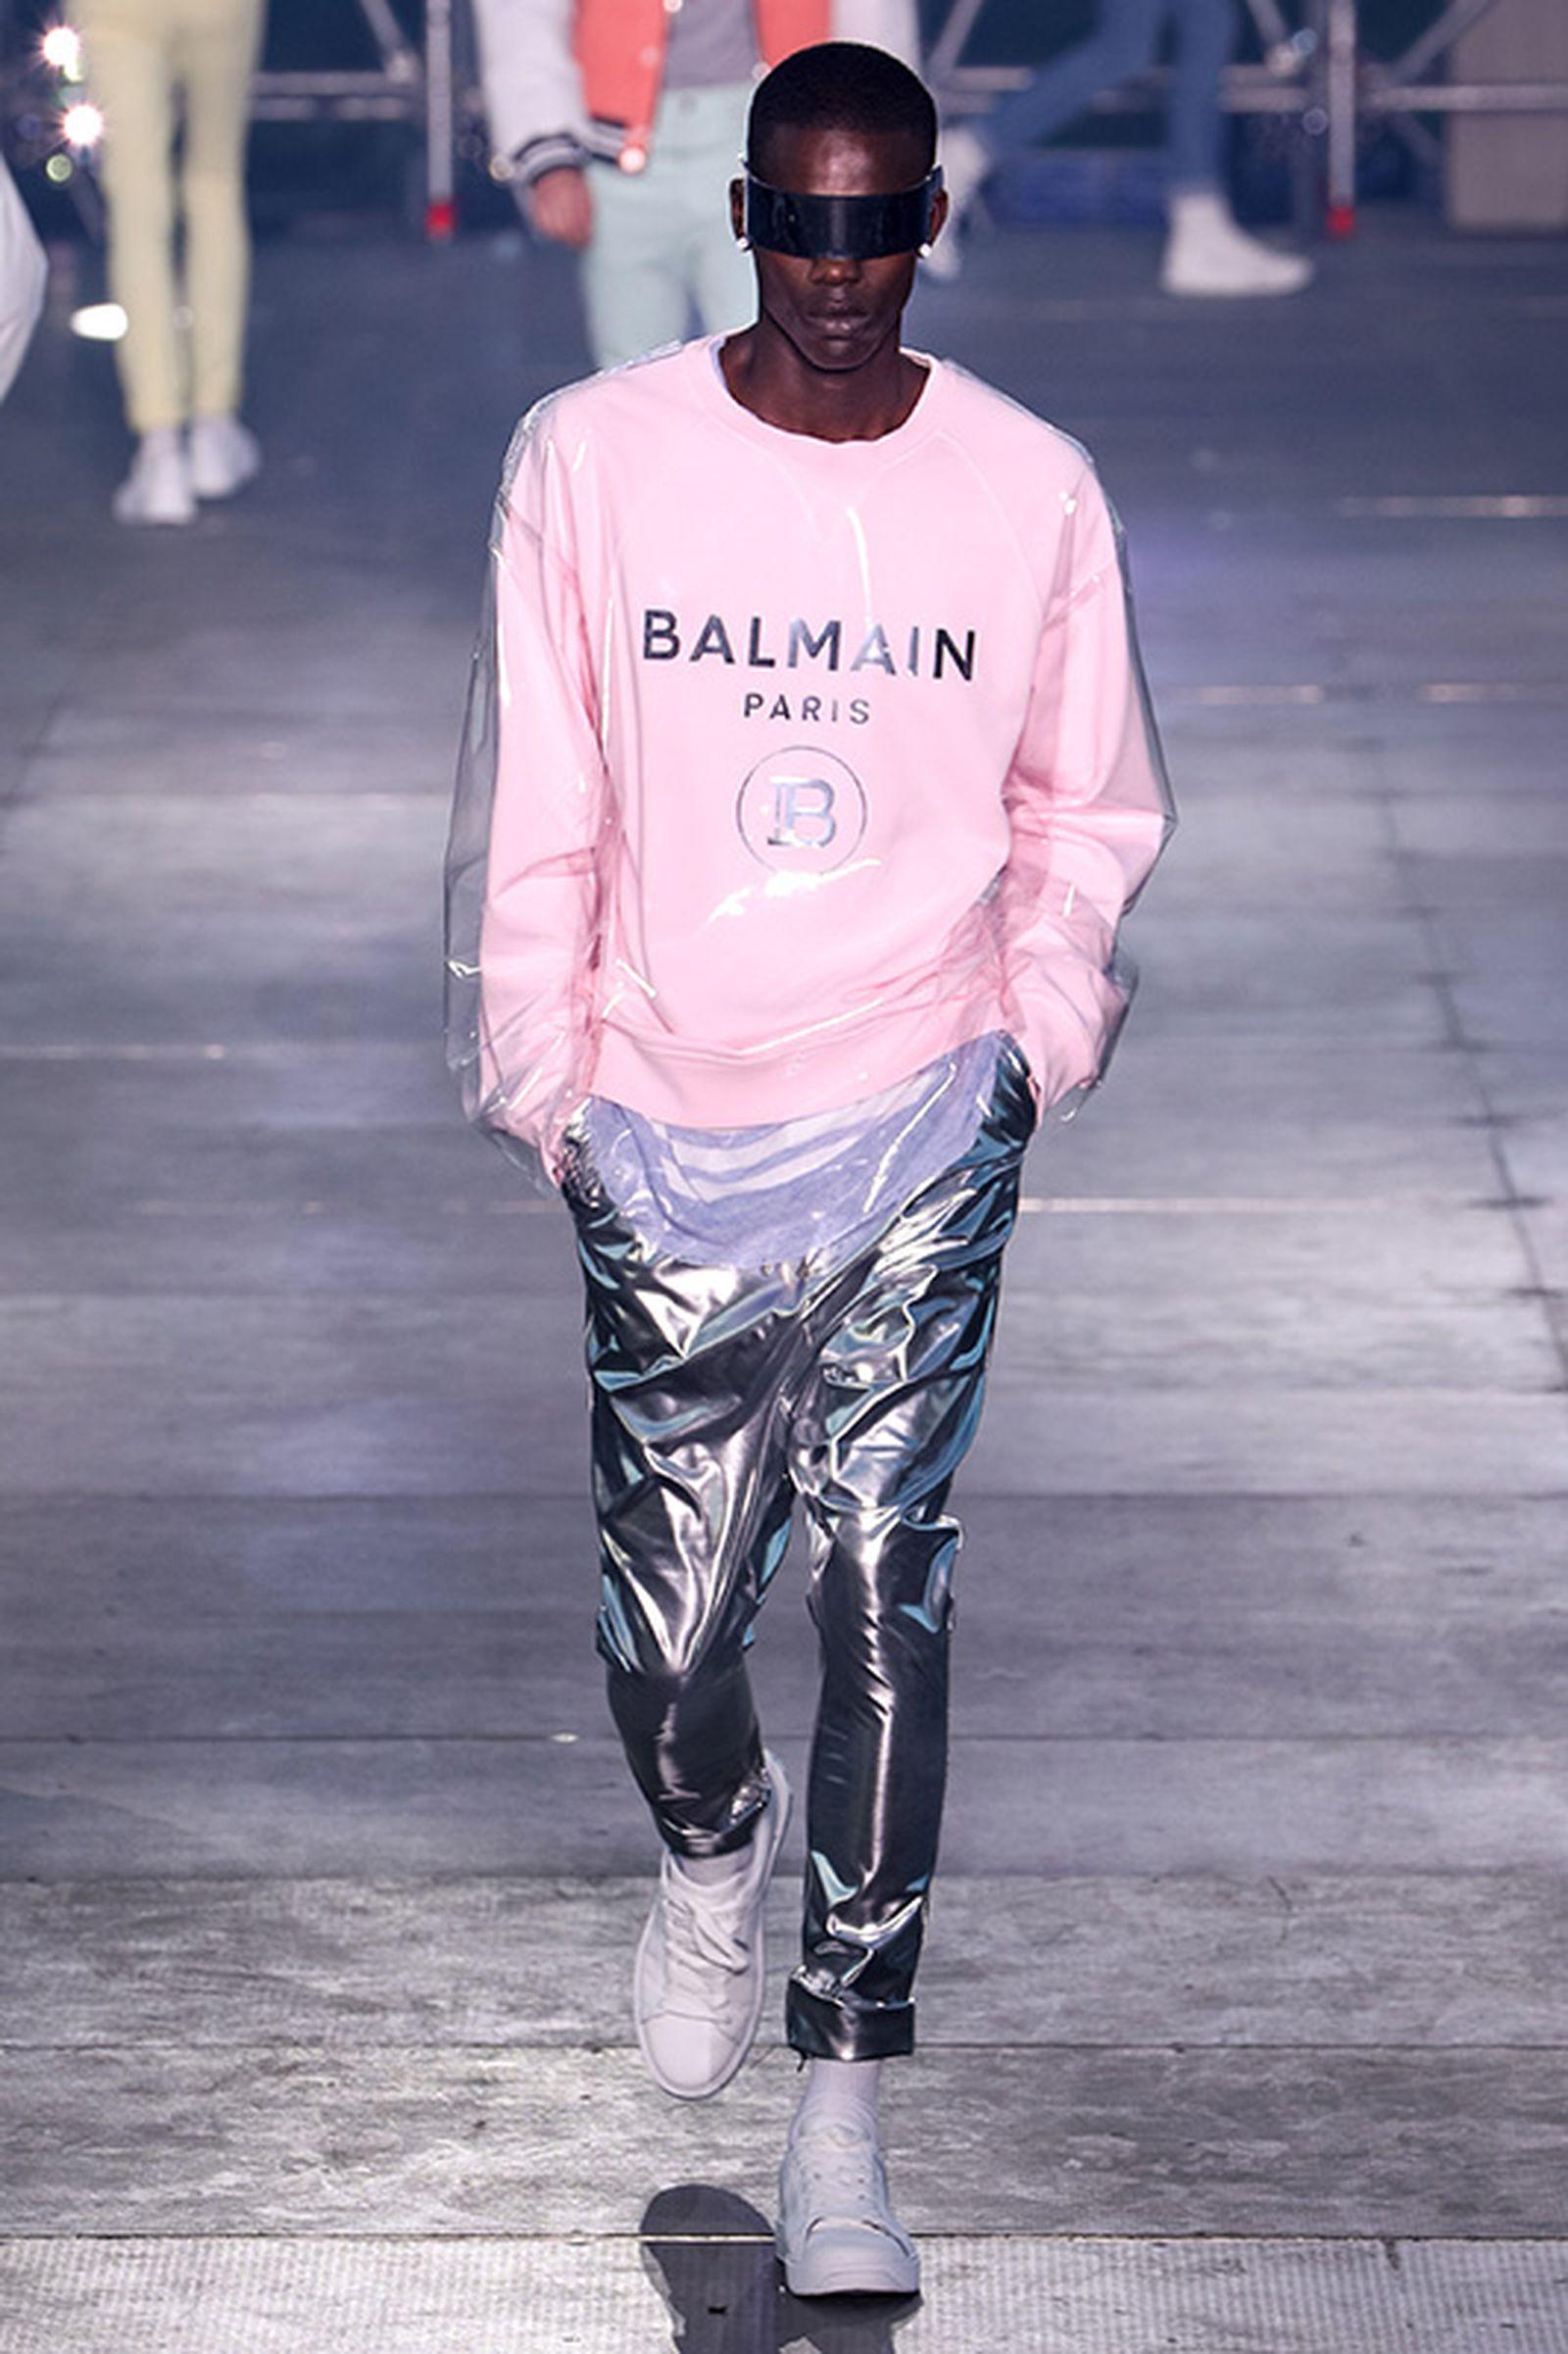 Balmain Festival V01:at Jardin des Plantes Olivier Rousteing paris fashion week runway